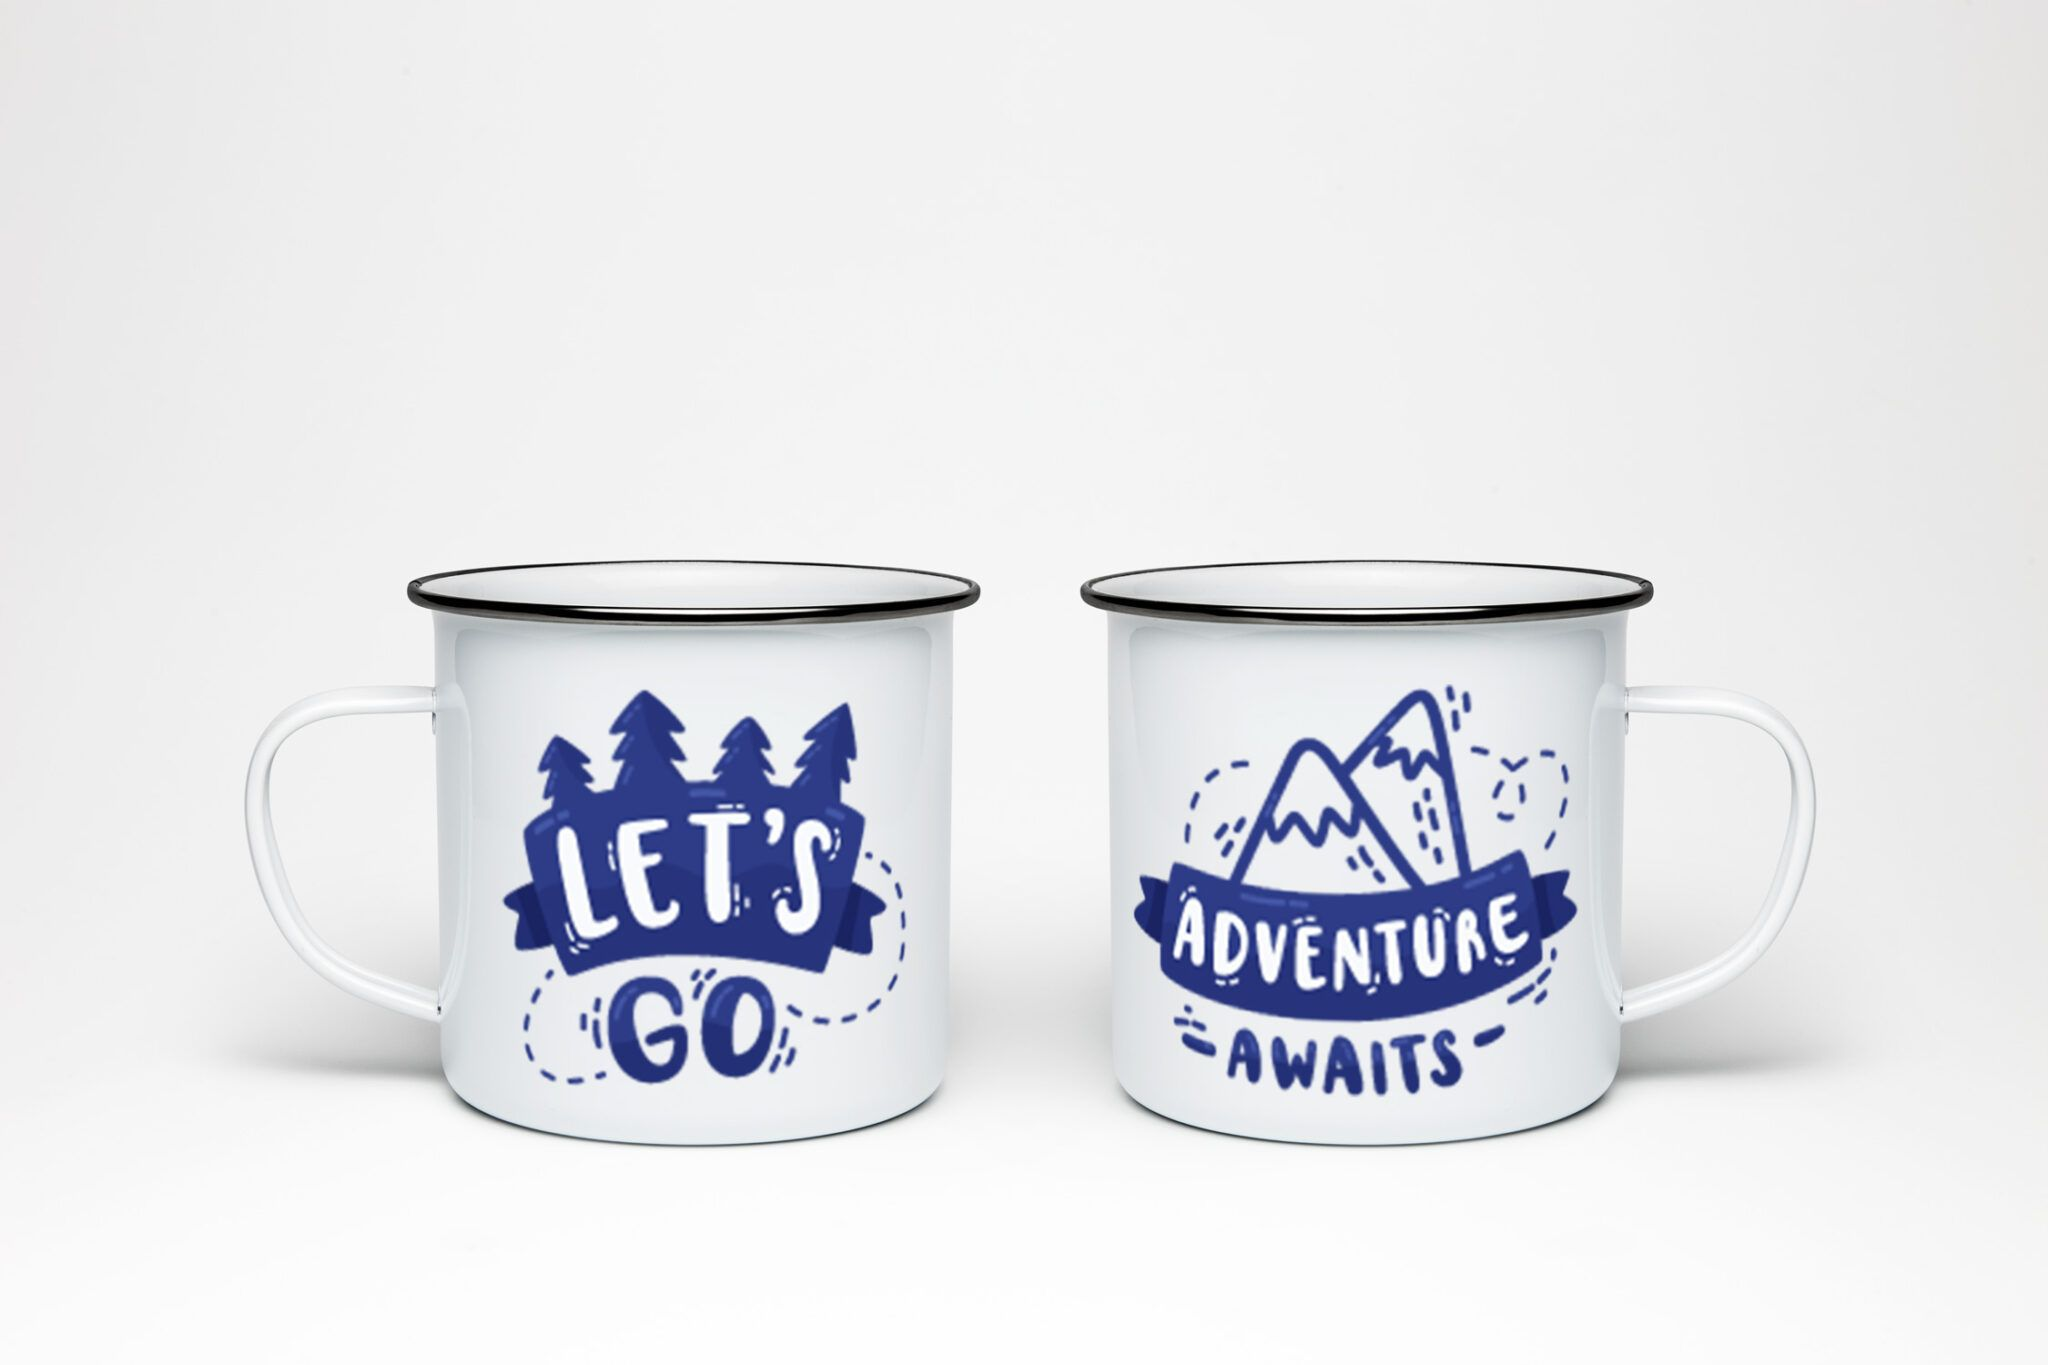 Plechový hrnek Let's Go Adventure Awaits, plecháček Let's Go Adventure Awaits